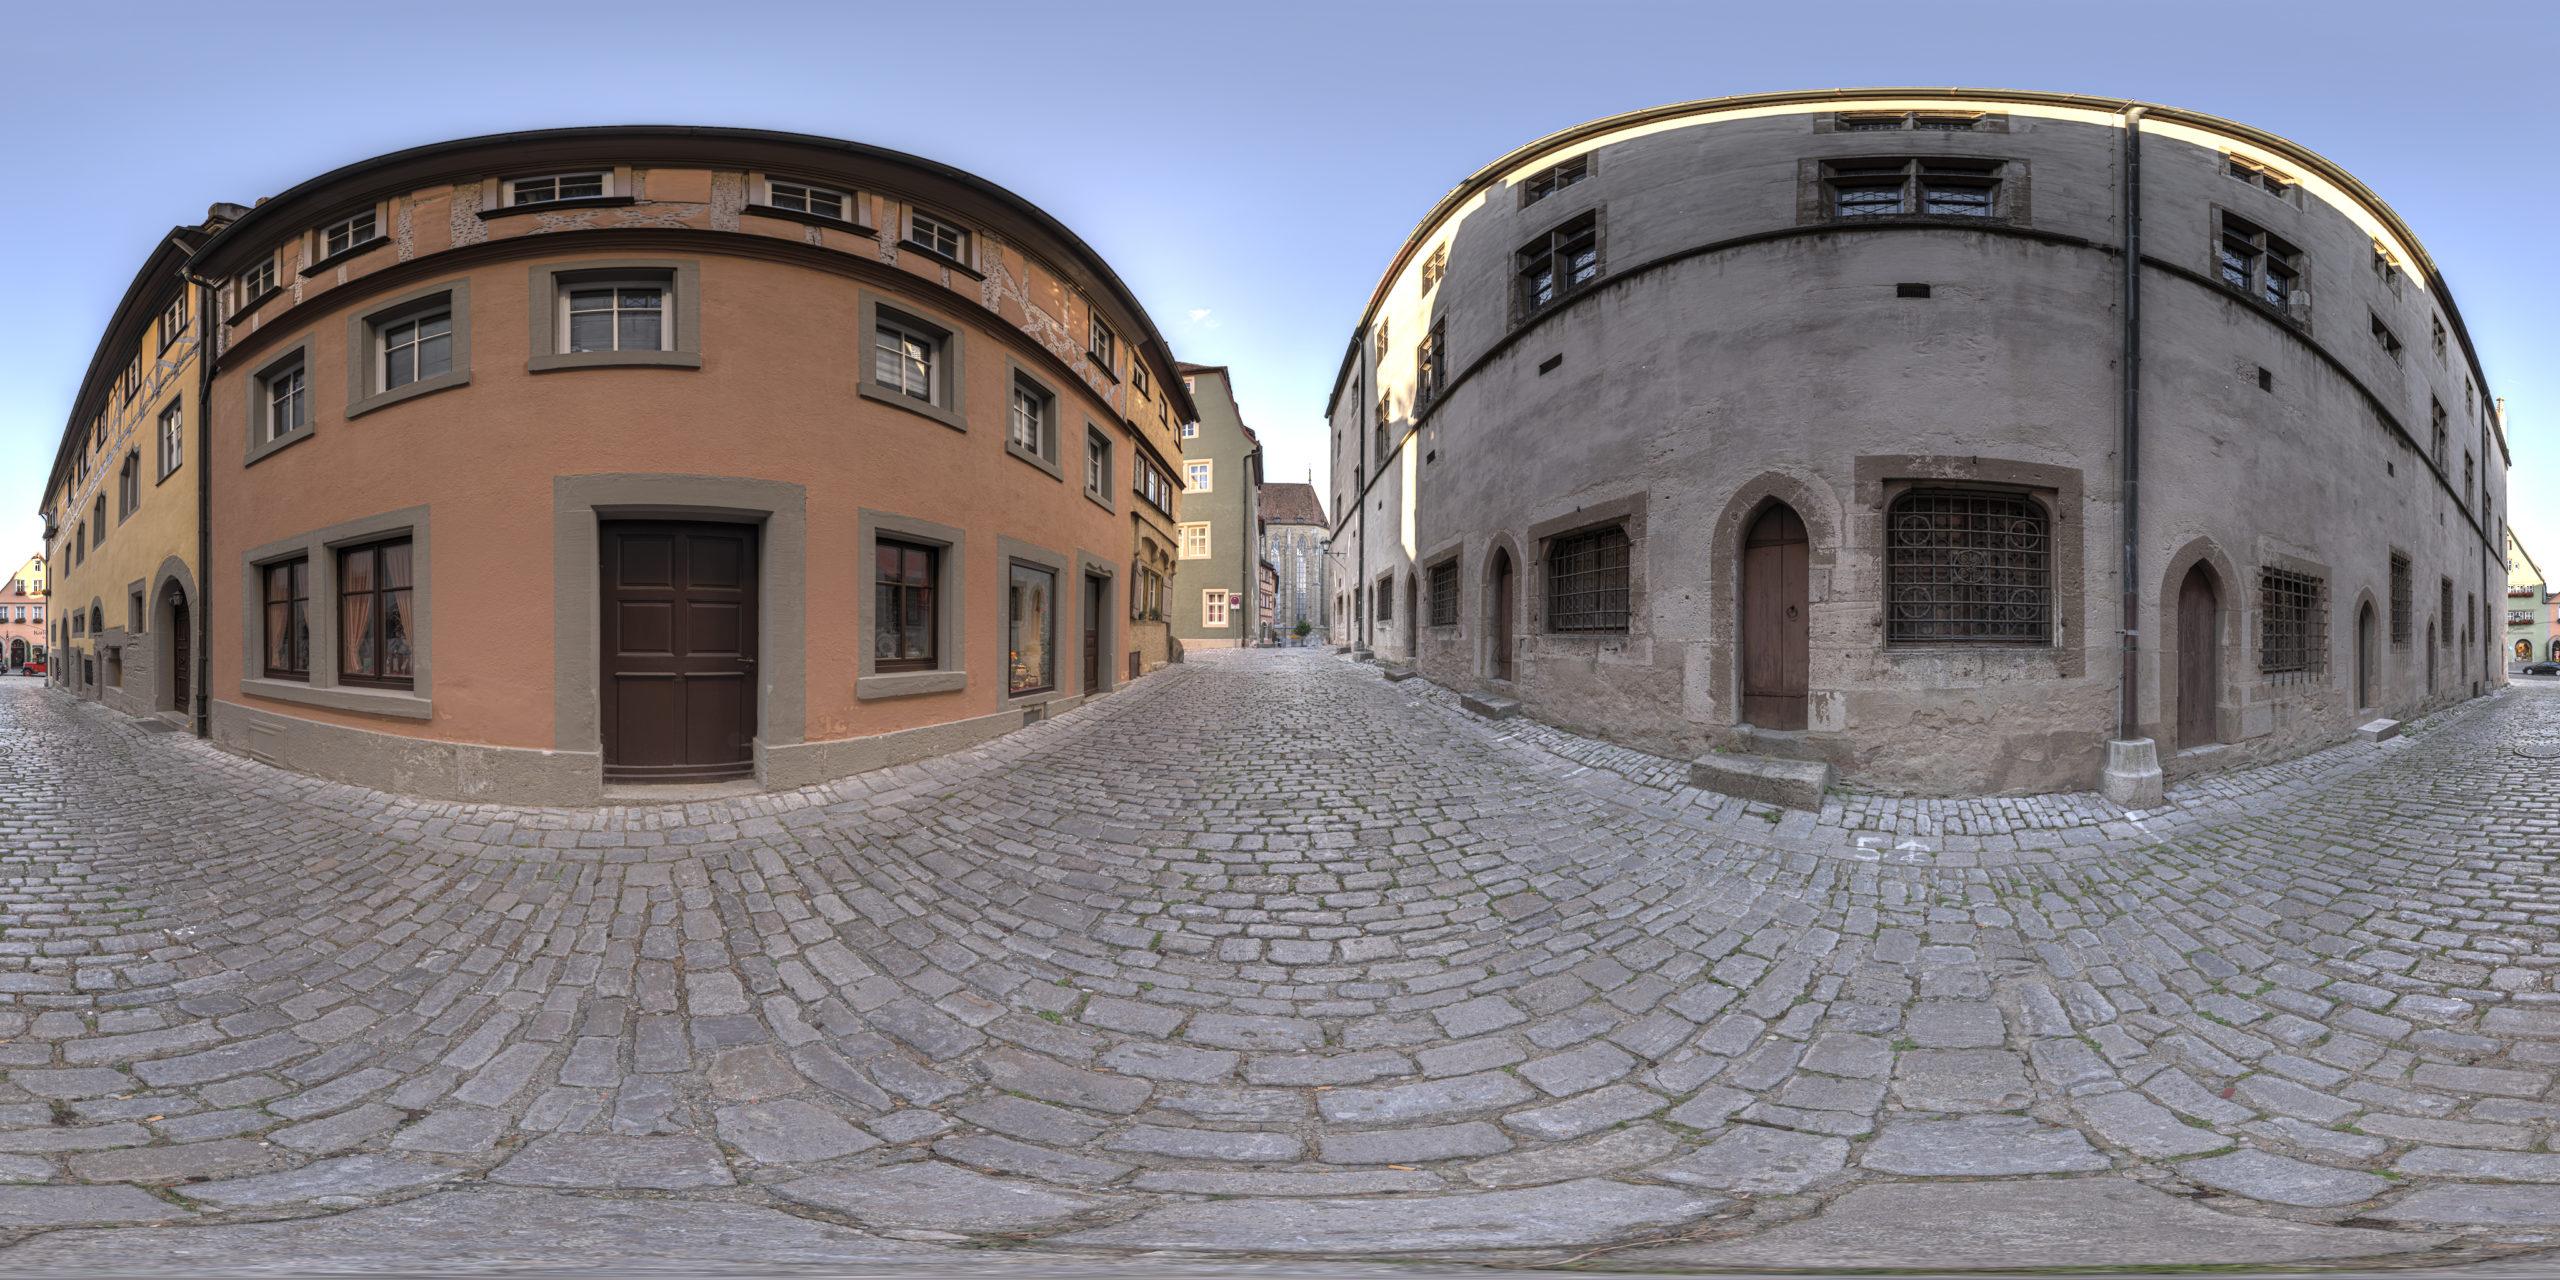 HDRI-Skies-Rosmaringäßchen-Rothenburg-Ob-Der-Tauber